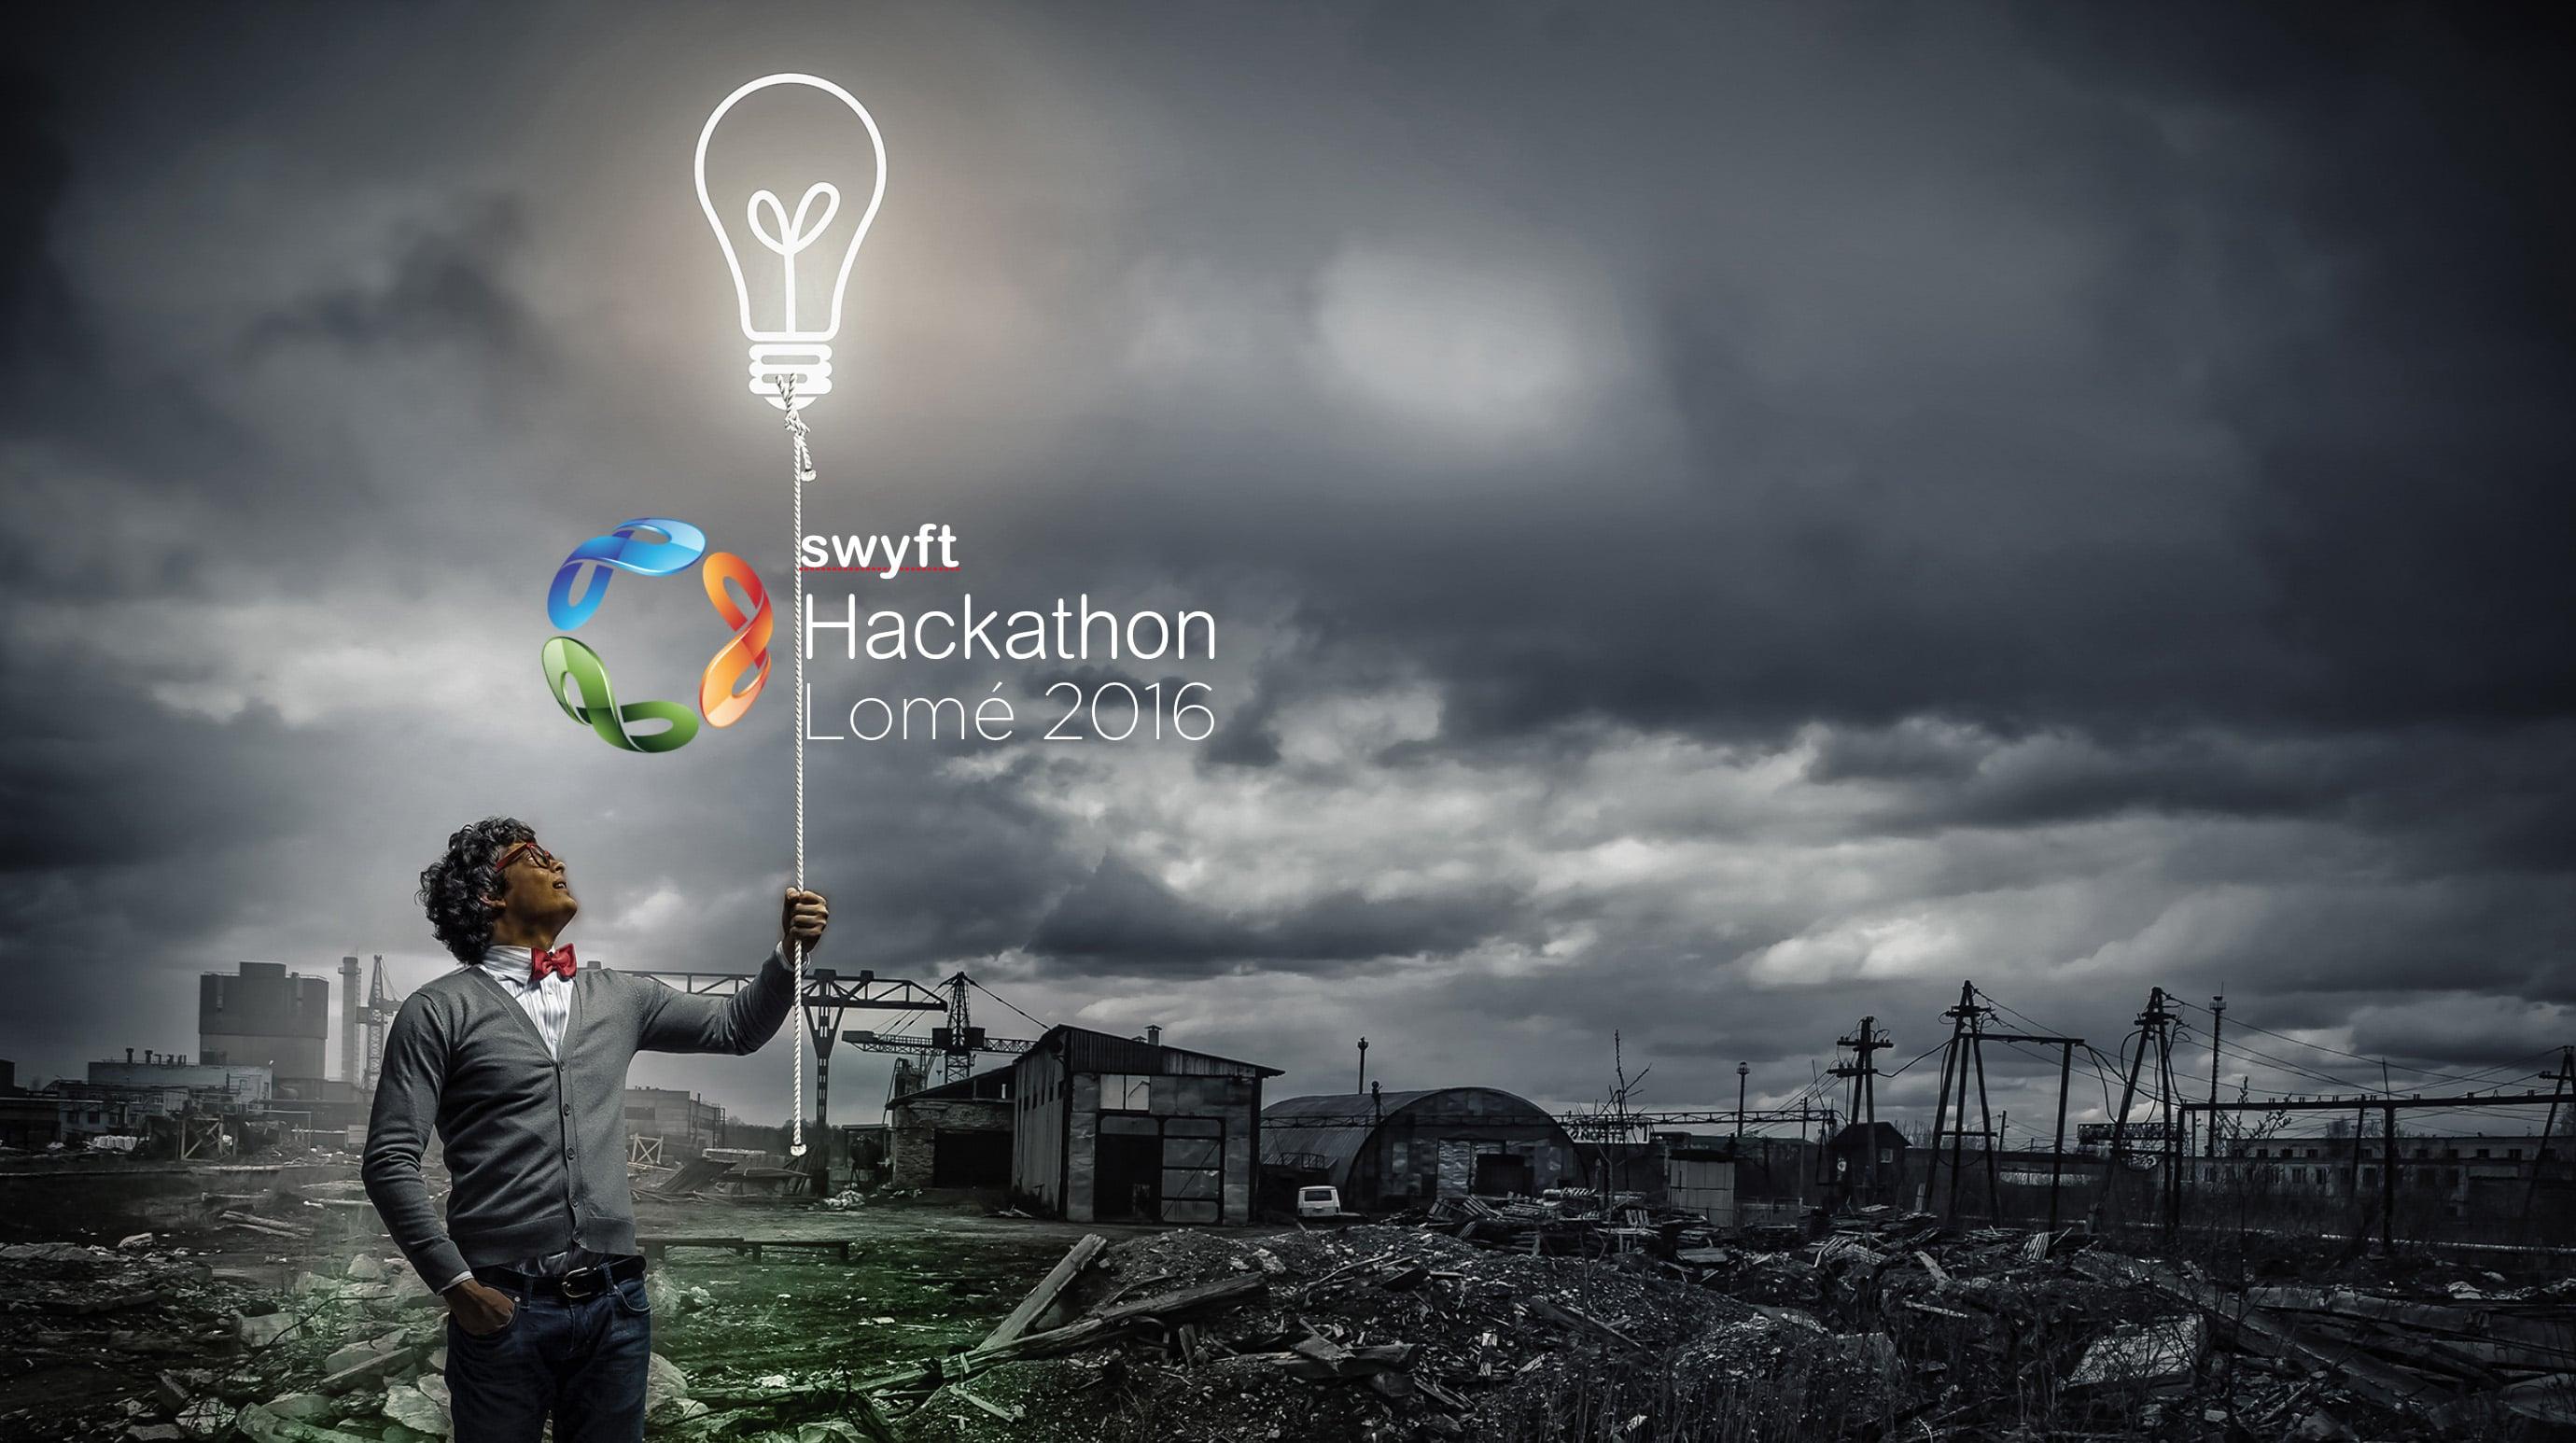 swyft Hackathon 02